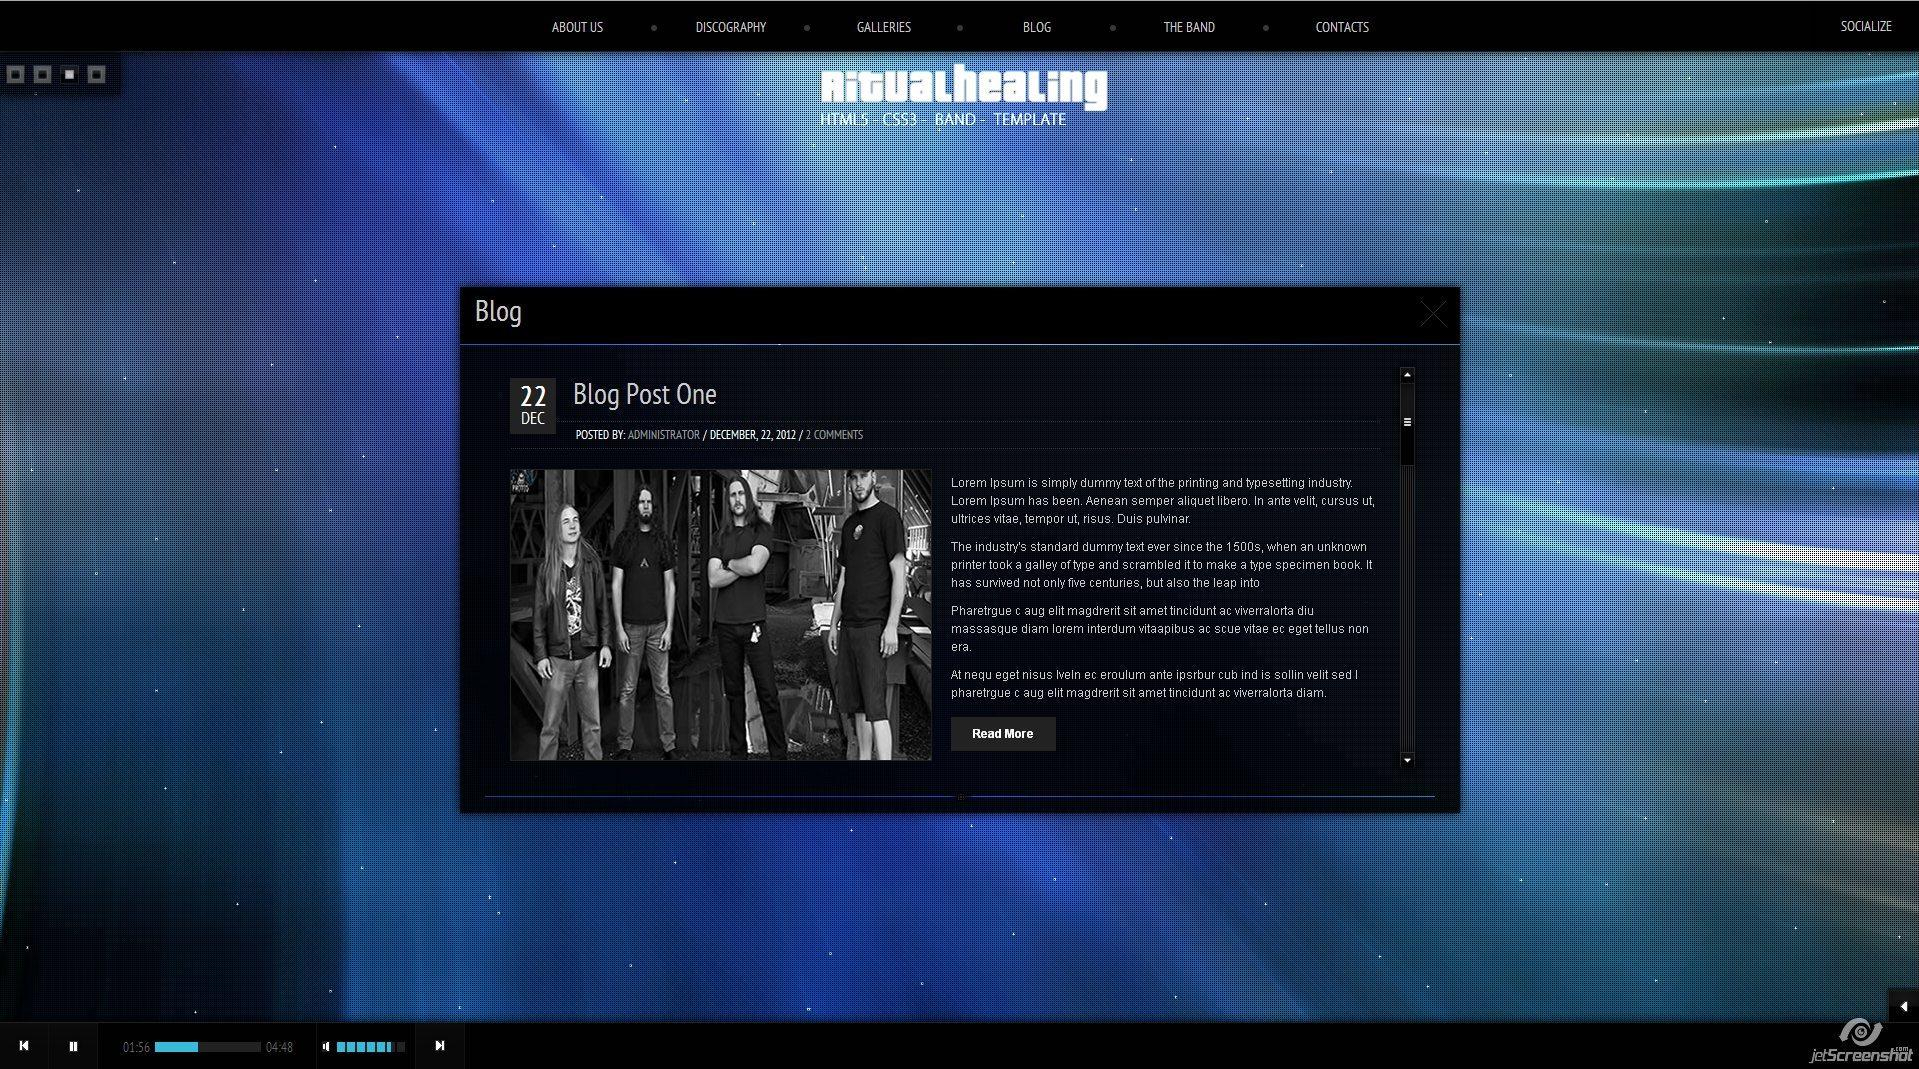 Ritualhealing Musician Template HTML5 CSS3 -